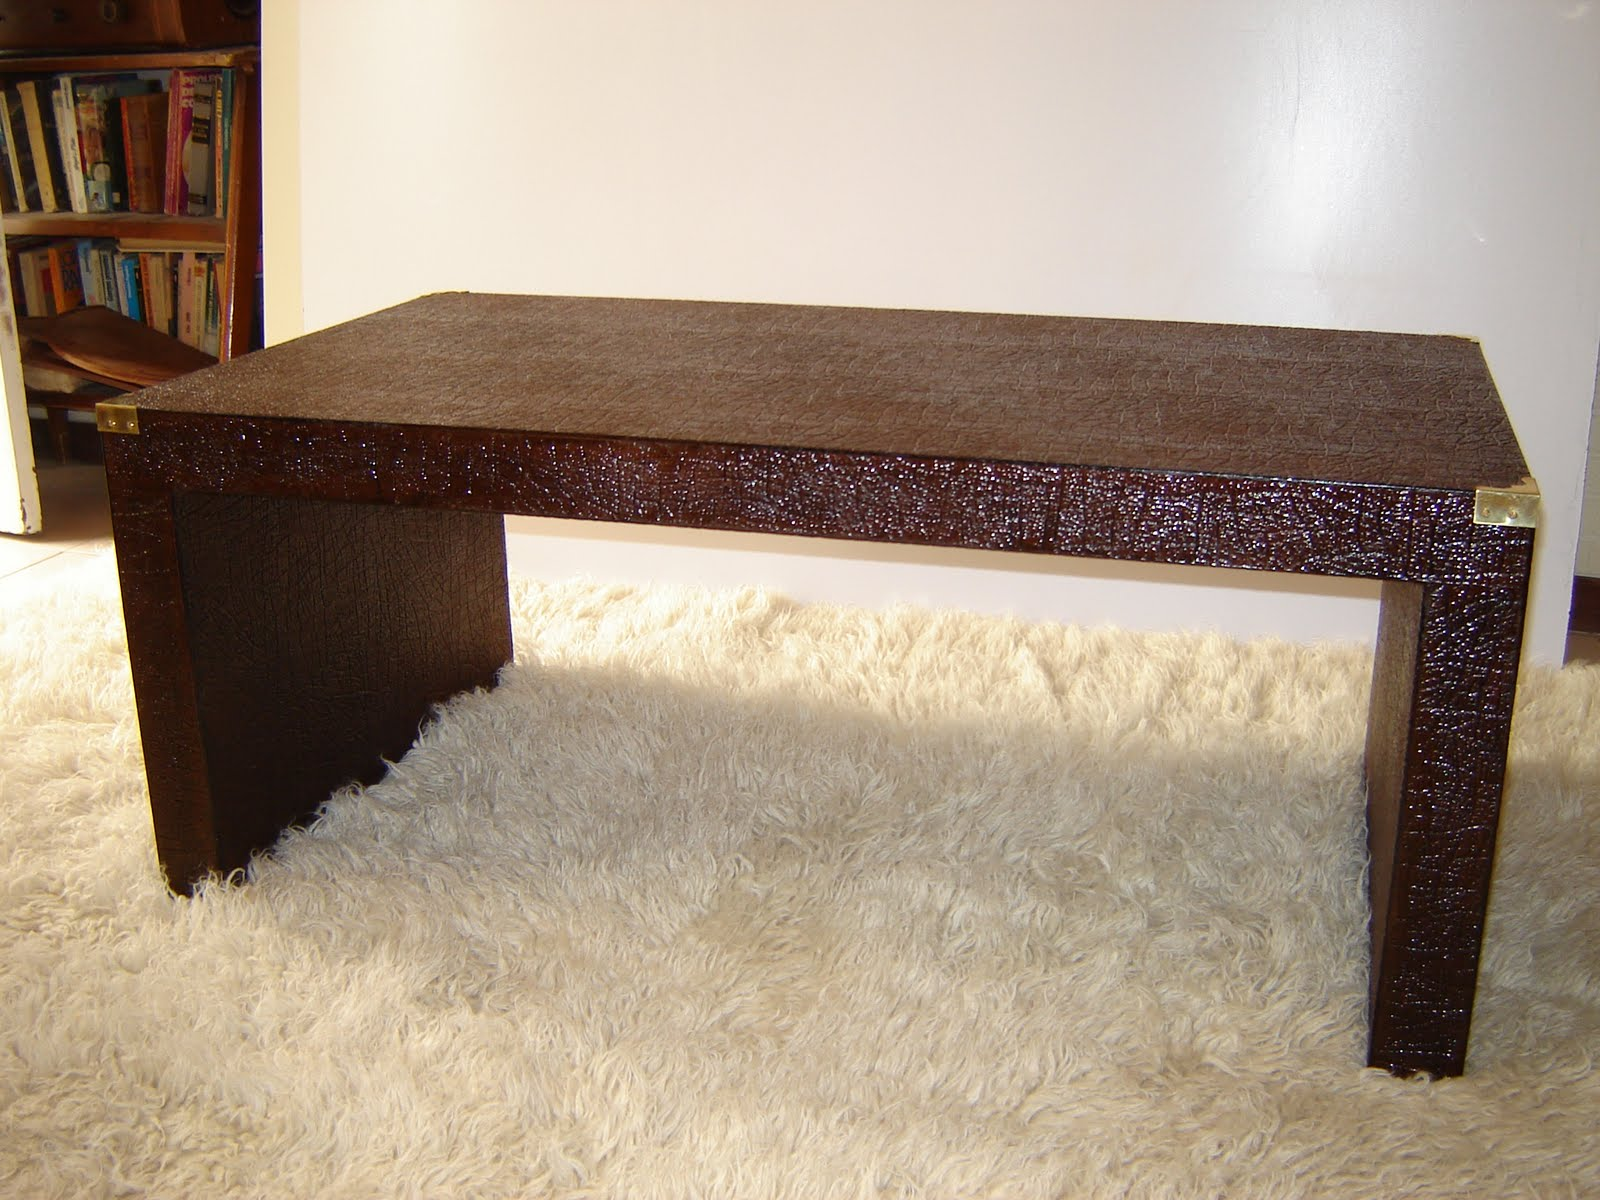 Dise os mesa ratona en imitaci n cuero laqueado con for Mesas diseno imitacion